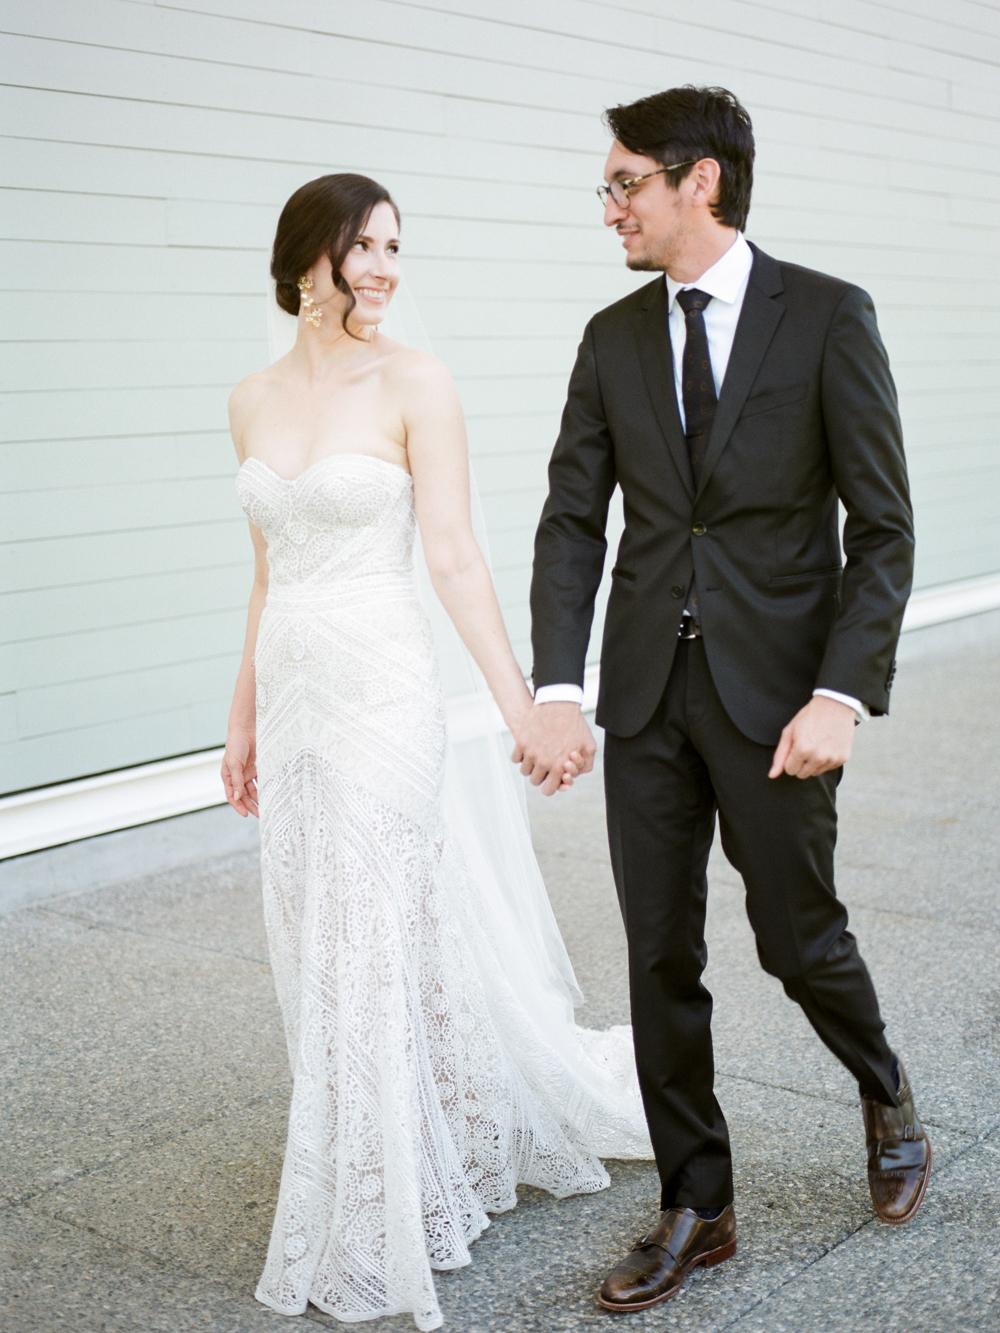 fall wedding at rothko chapel- houston wedding photographer-christine gosch - film photographer - elopement photographer- intimate wedding - lovely bride wedding gown-8.jpg